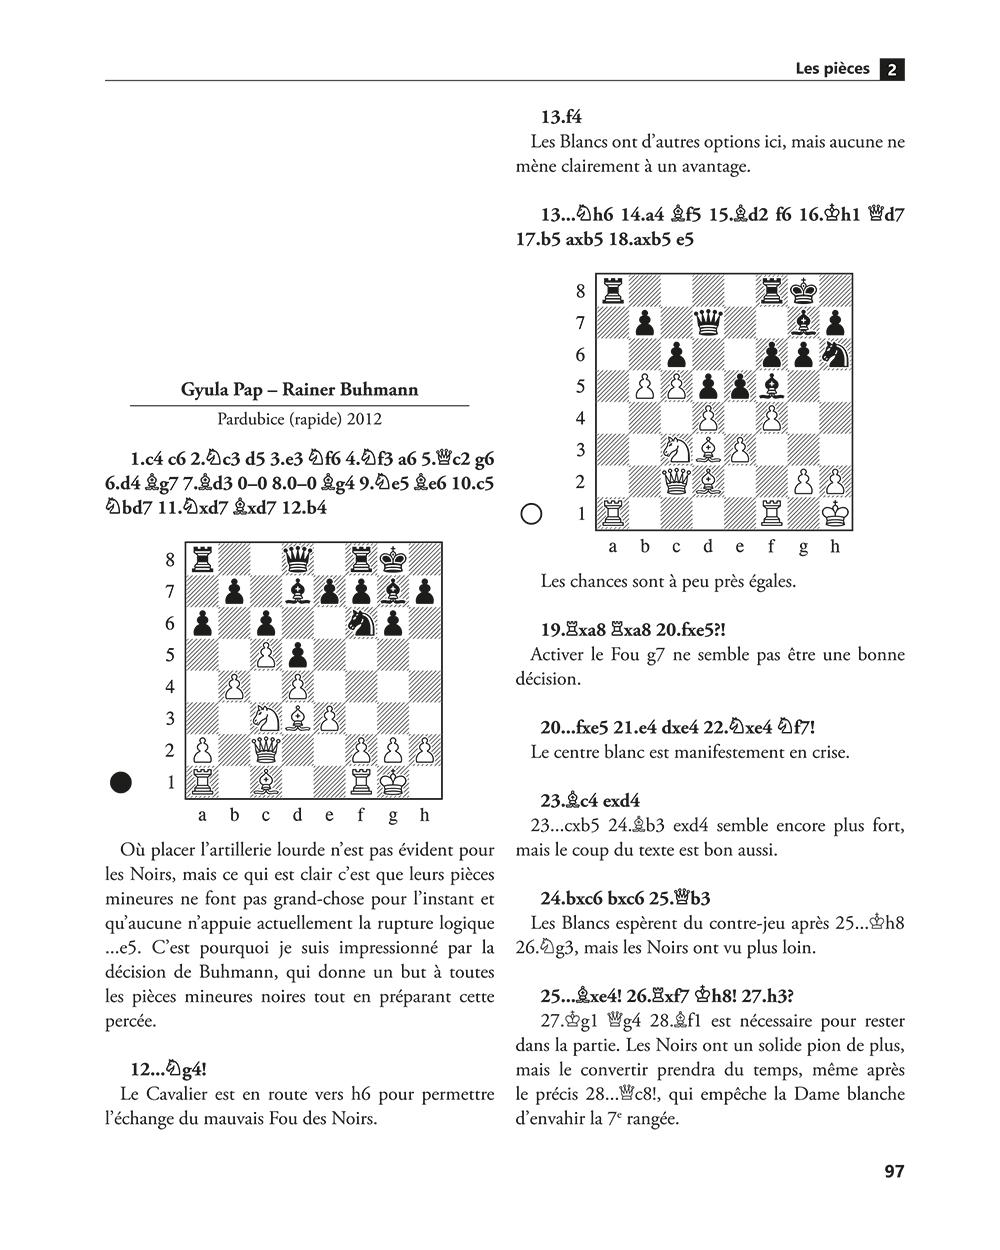 Objectif grand maître - Le jeu stratégique - Jacob Aagaard